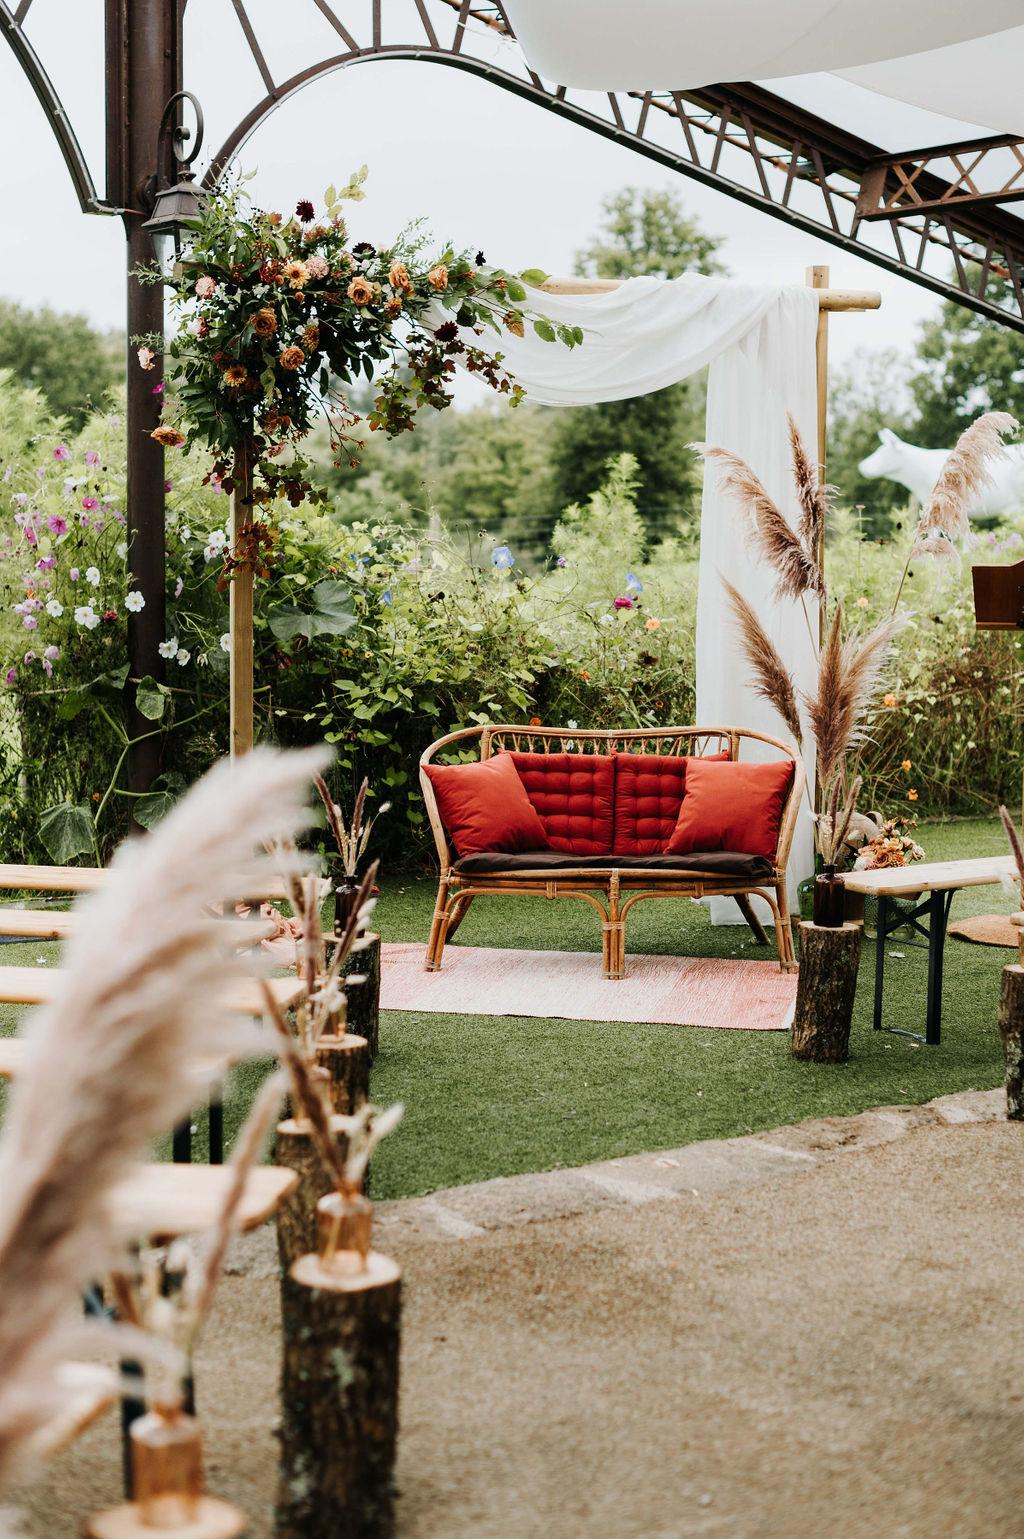 decoration mariage vendee fleuriste automne